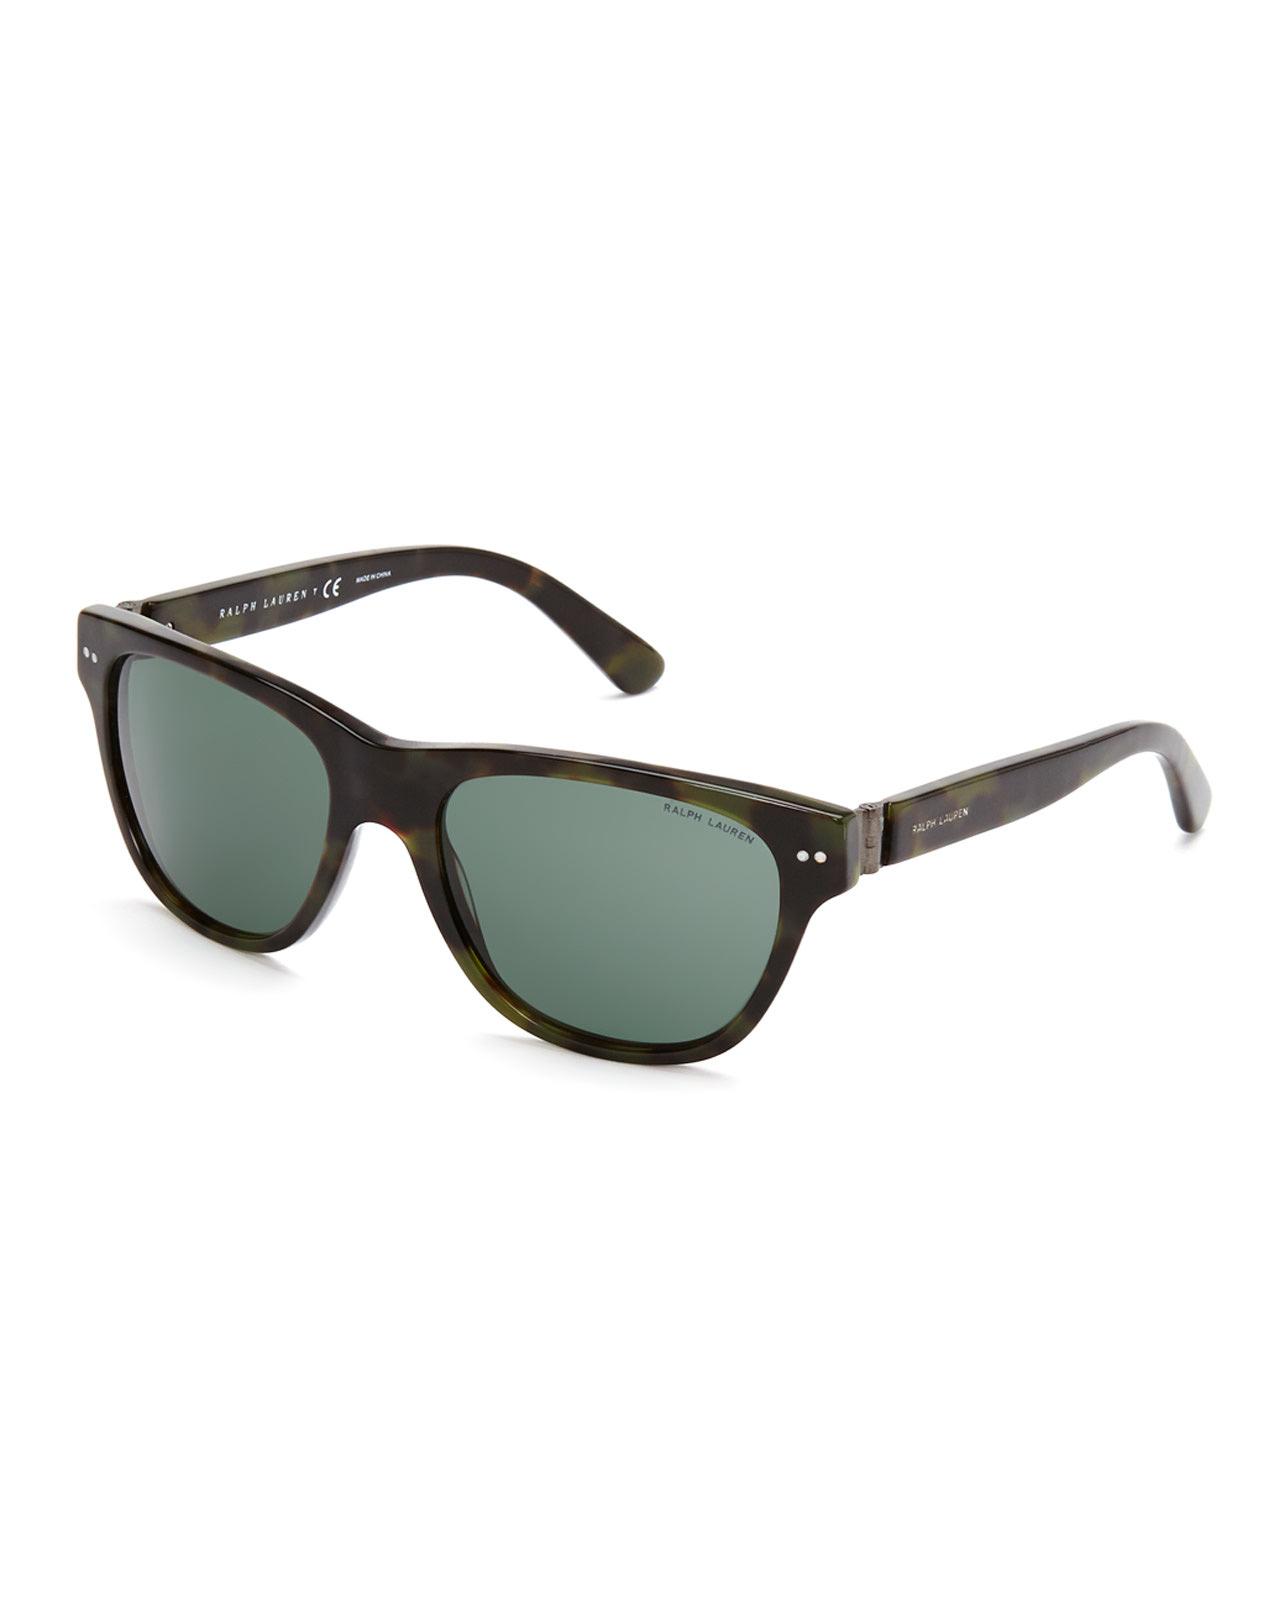 d02f2ae5b1 Ralph Lauren. Men s Black Ph 4080 Green Tortoiseshell-Look Wayfarer  Sunglasses